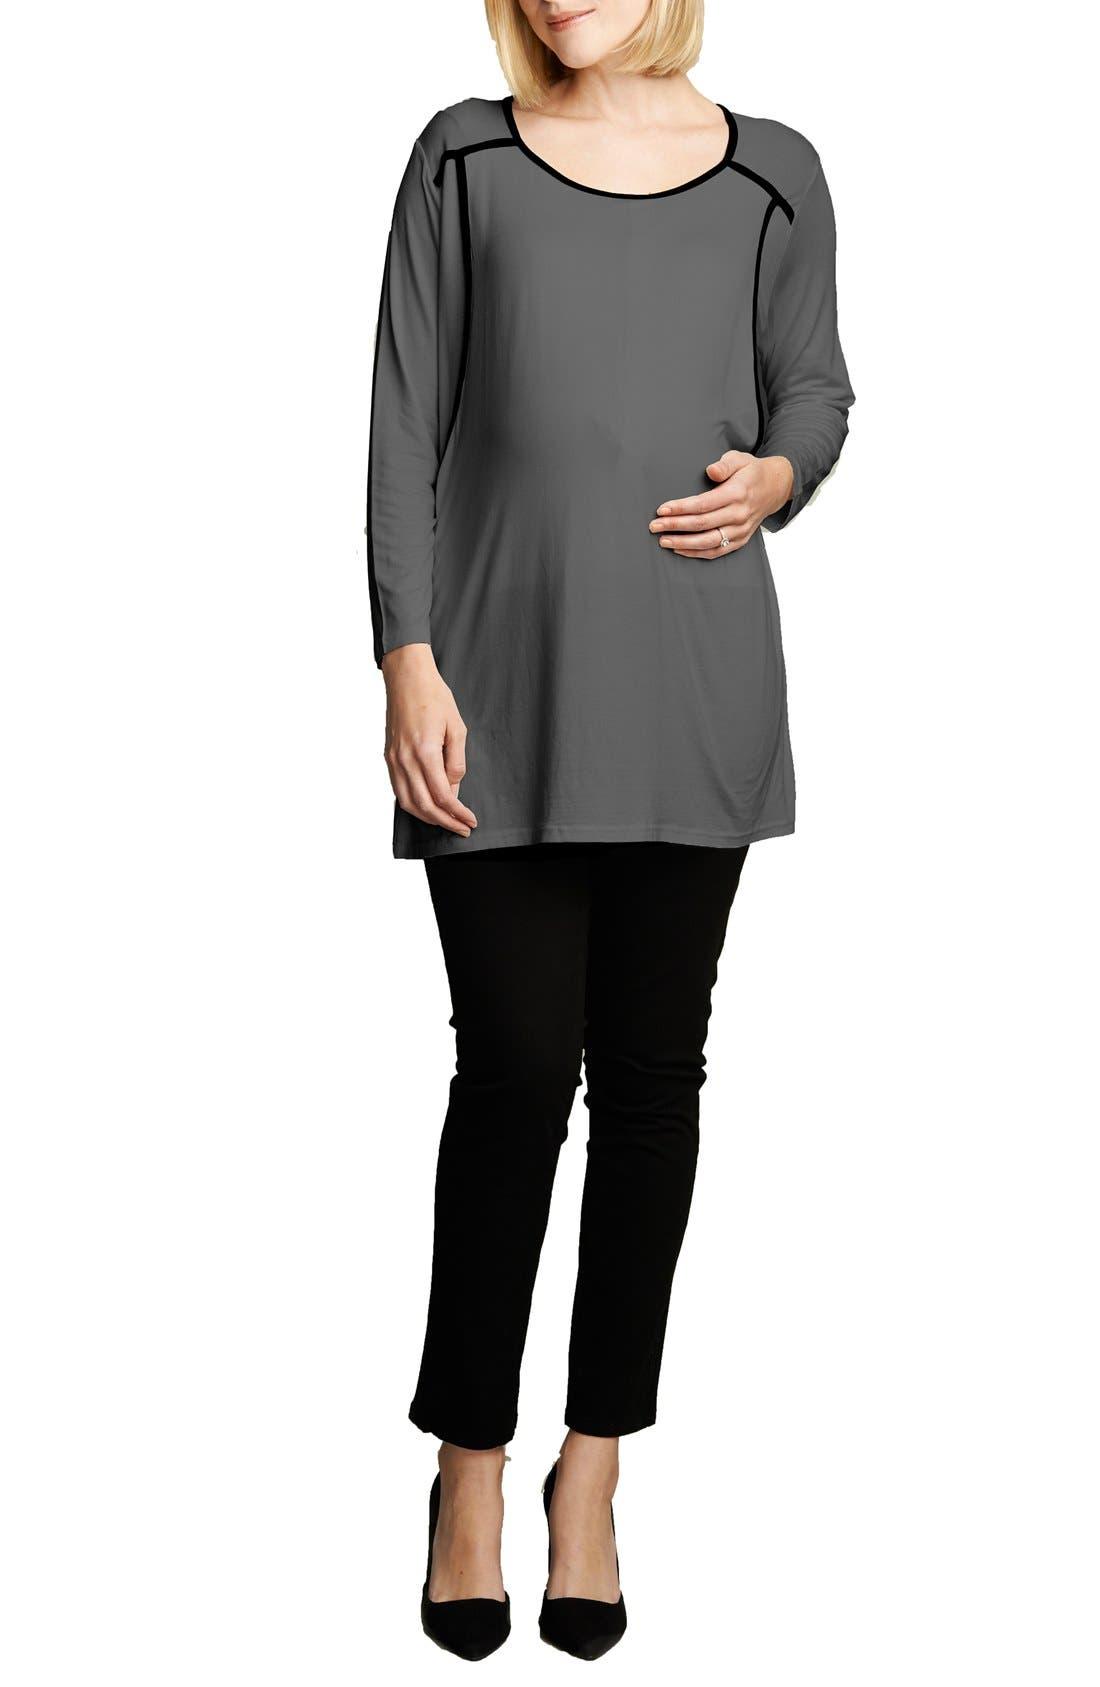 Long Sleeve Nursing Top,                         Main,                         color, CHARCOAL/BLACK